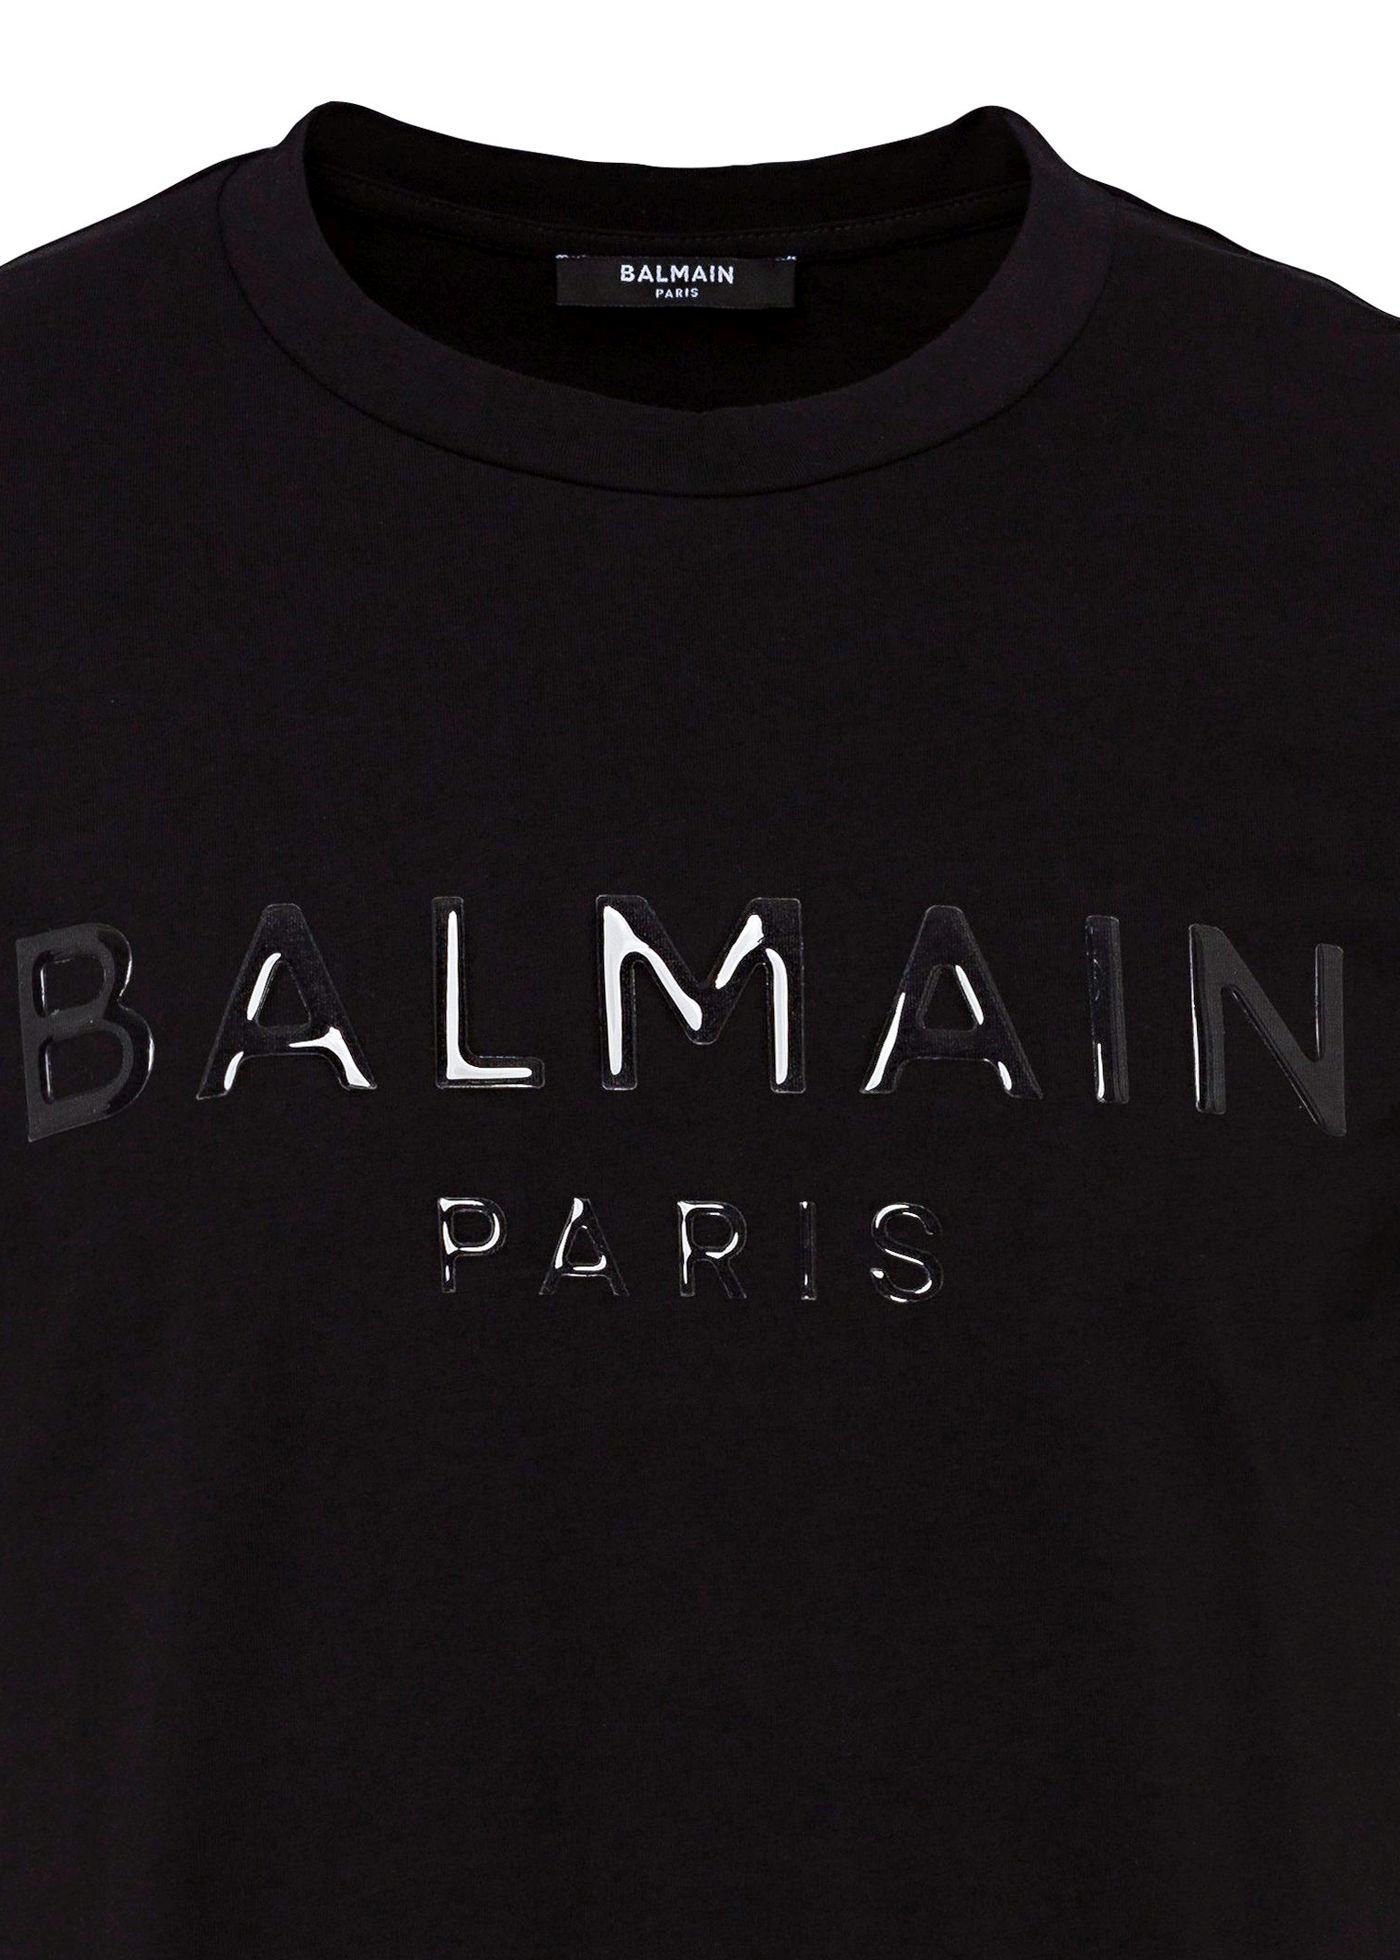 BALMAIN RESIN TS image number 2